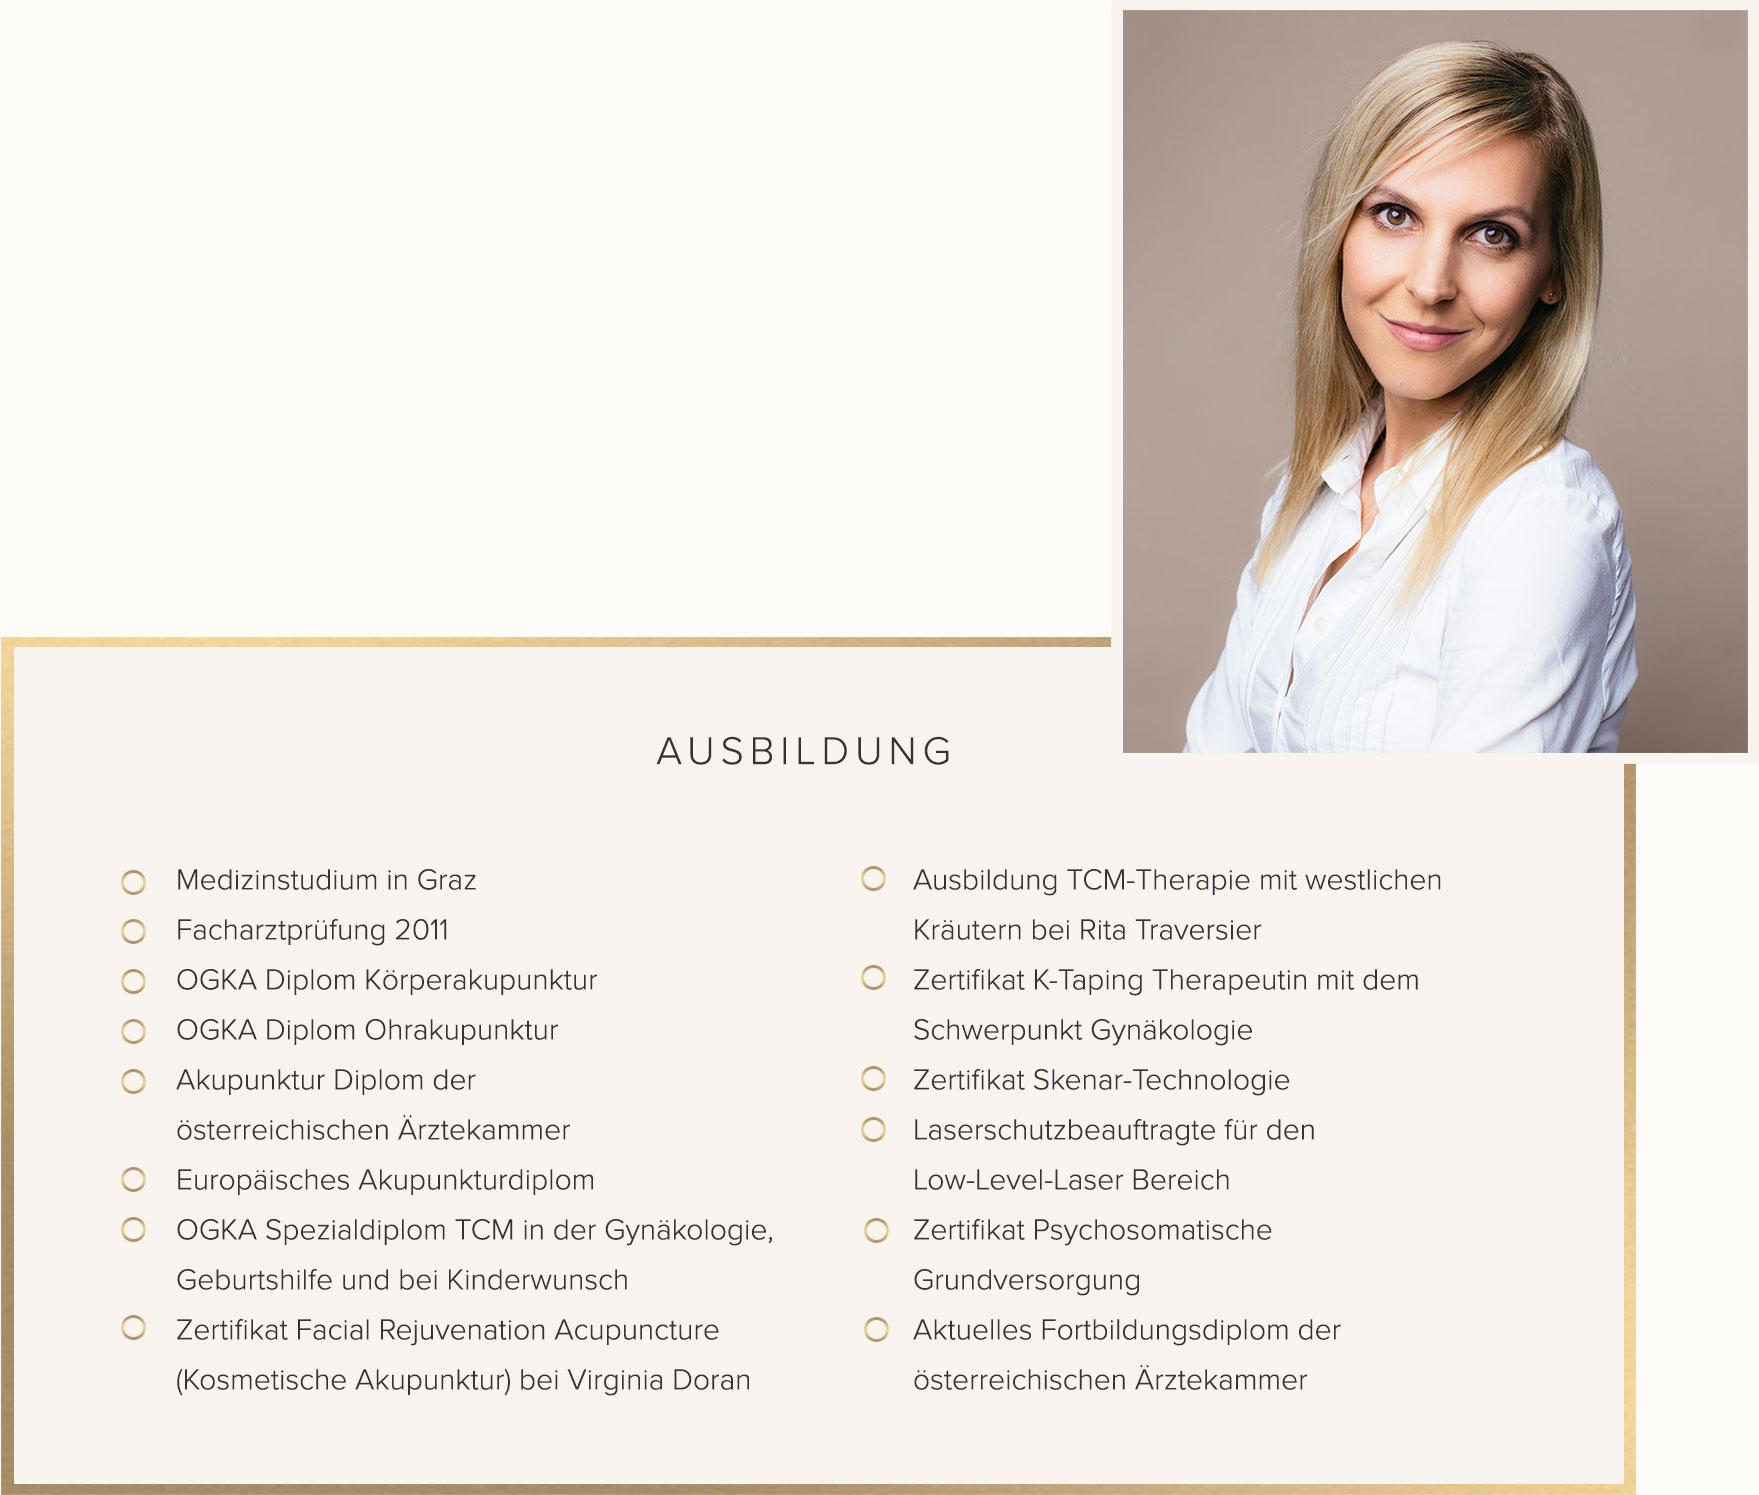 Dr. Monika Schabl